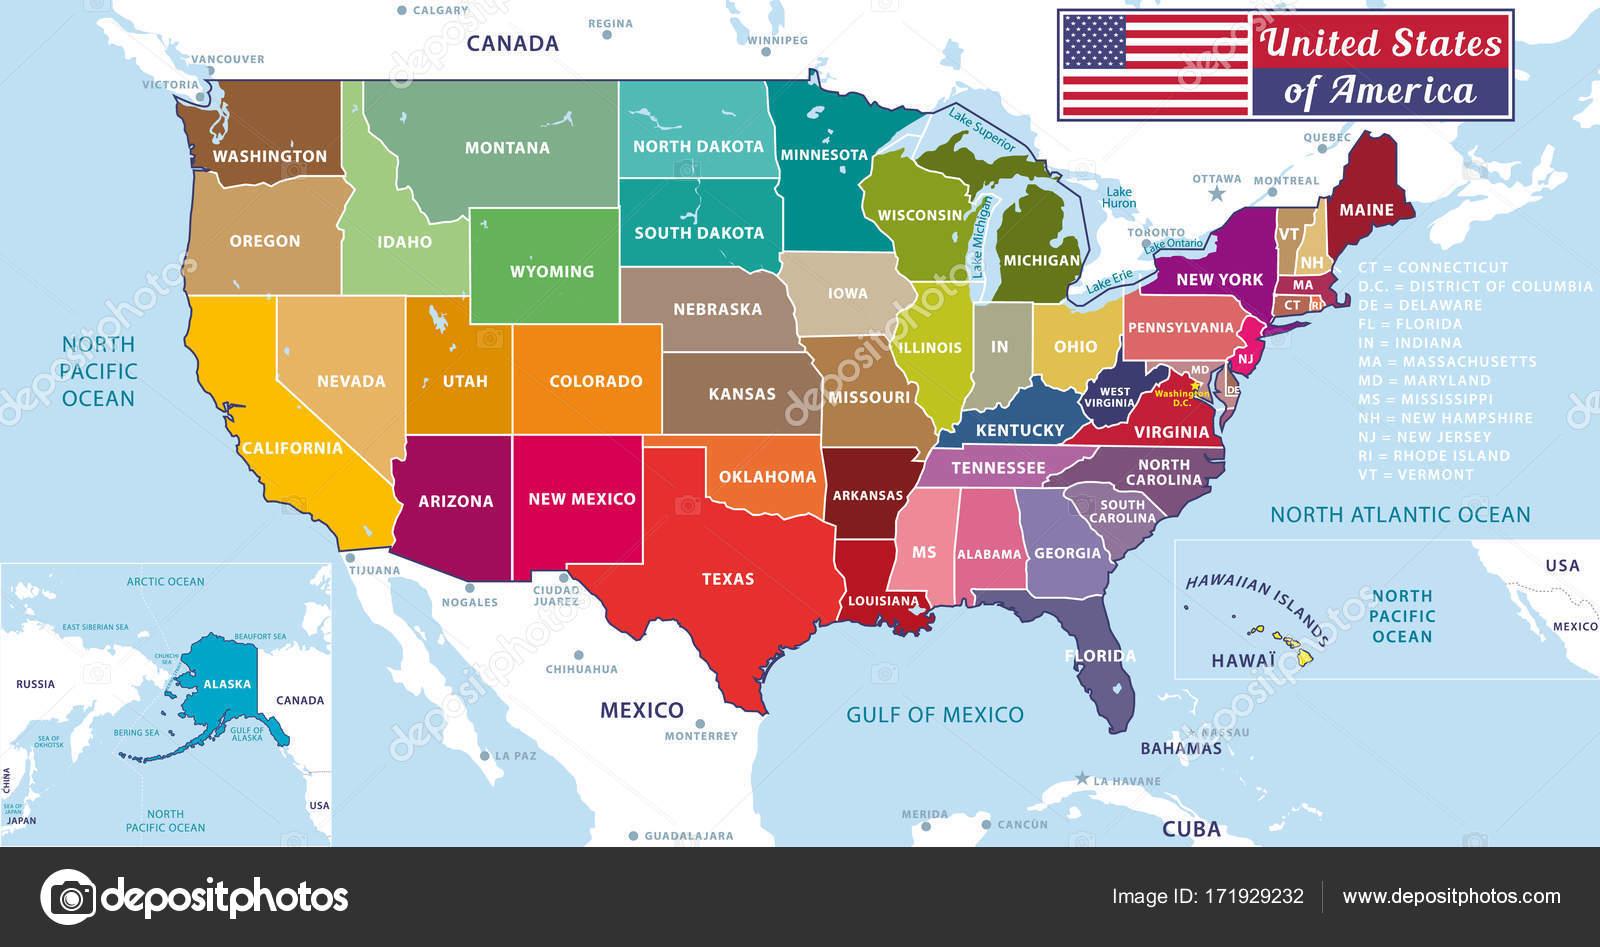 United States of America Beautiful modern graphic USA map 50